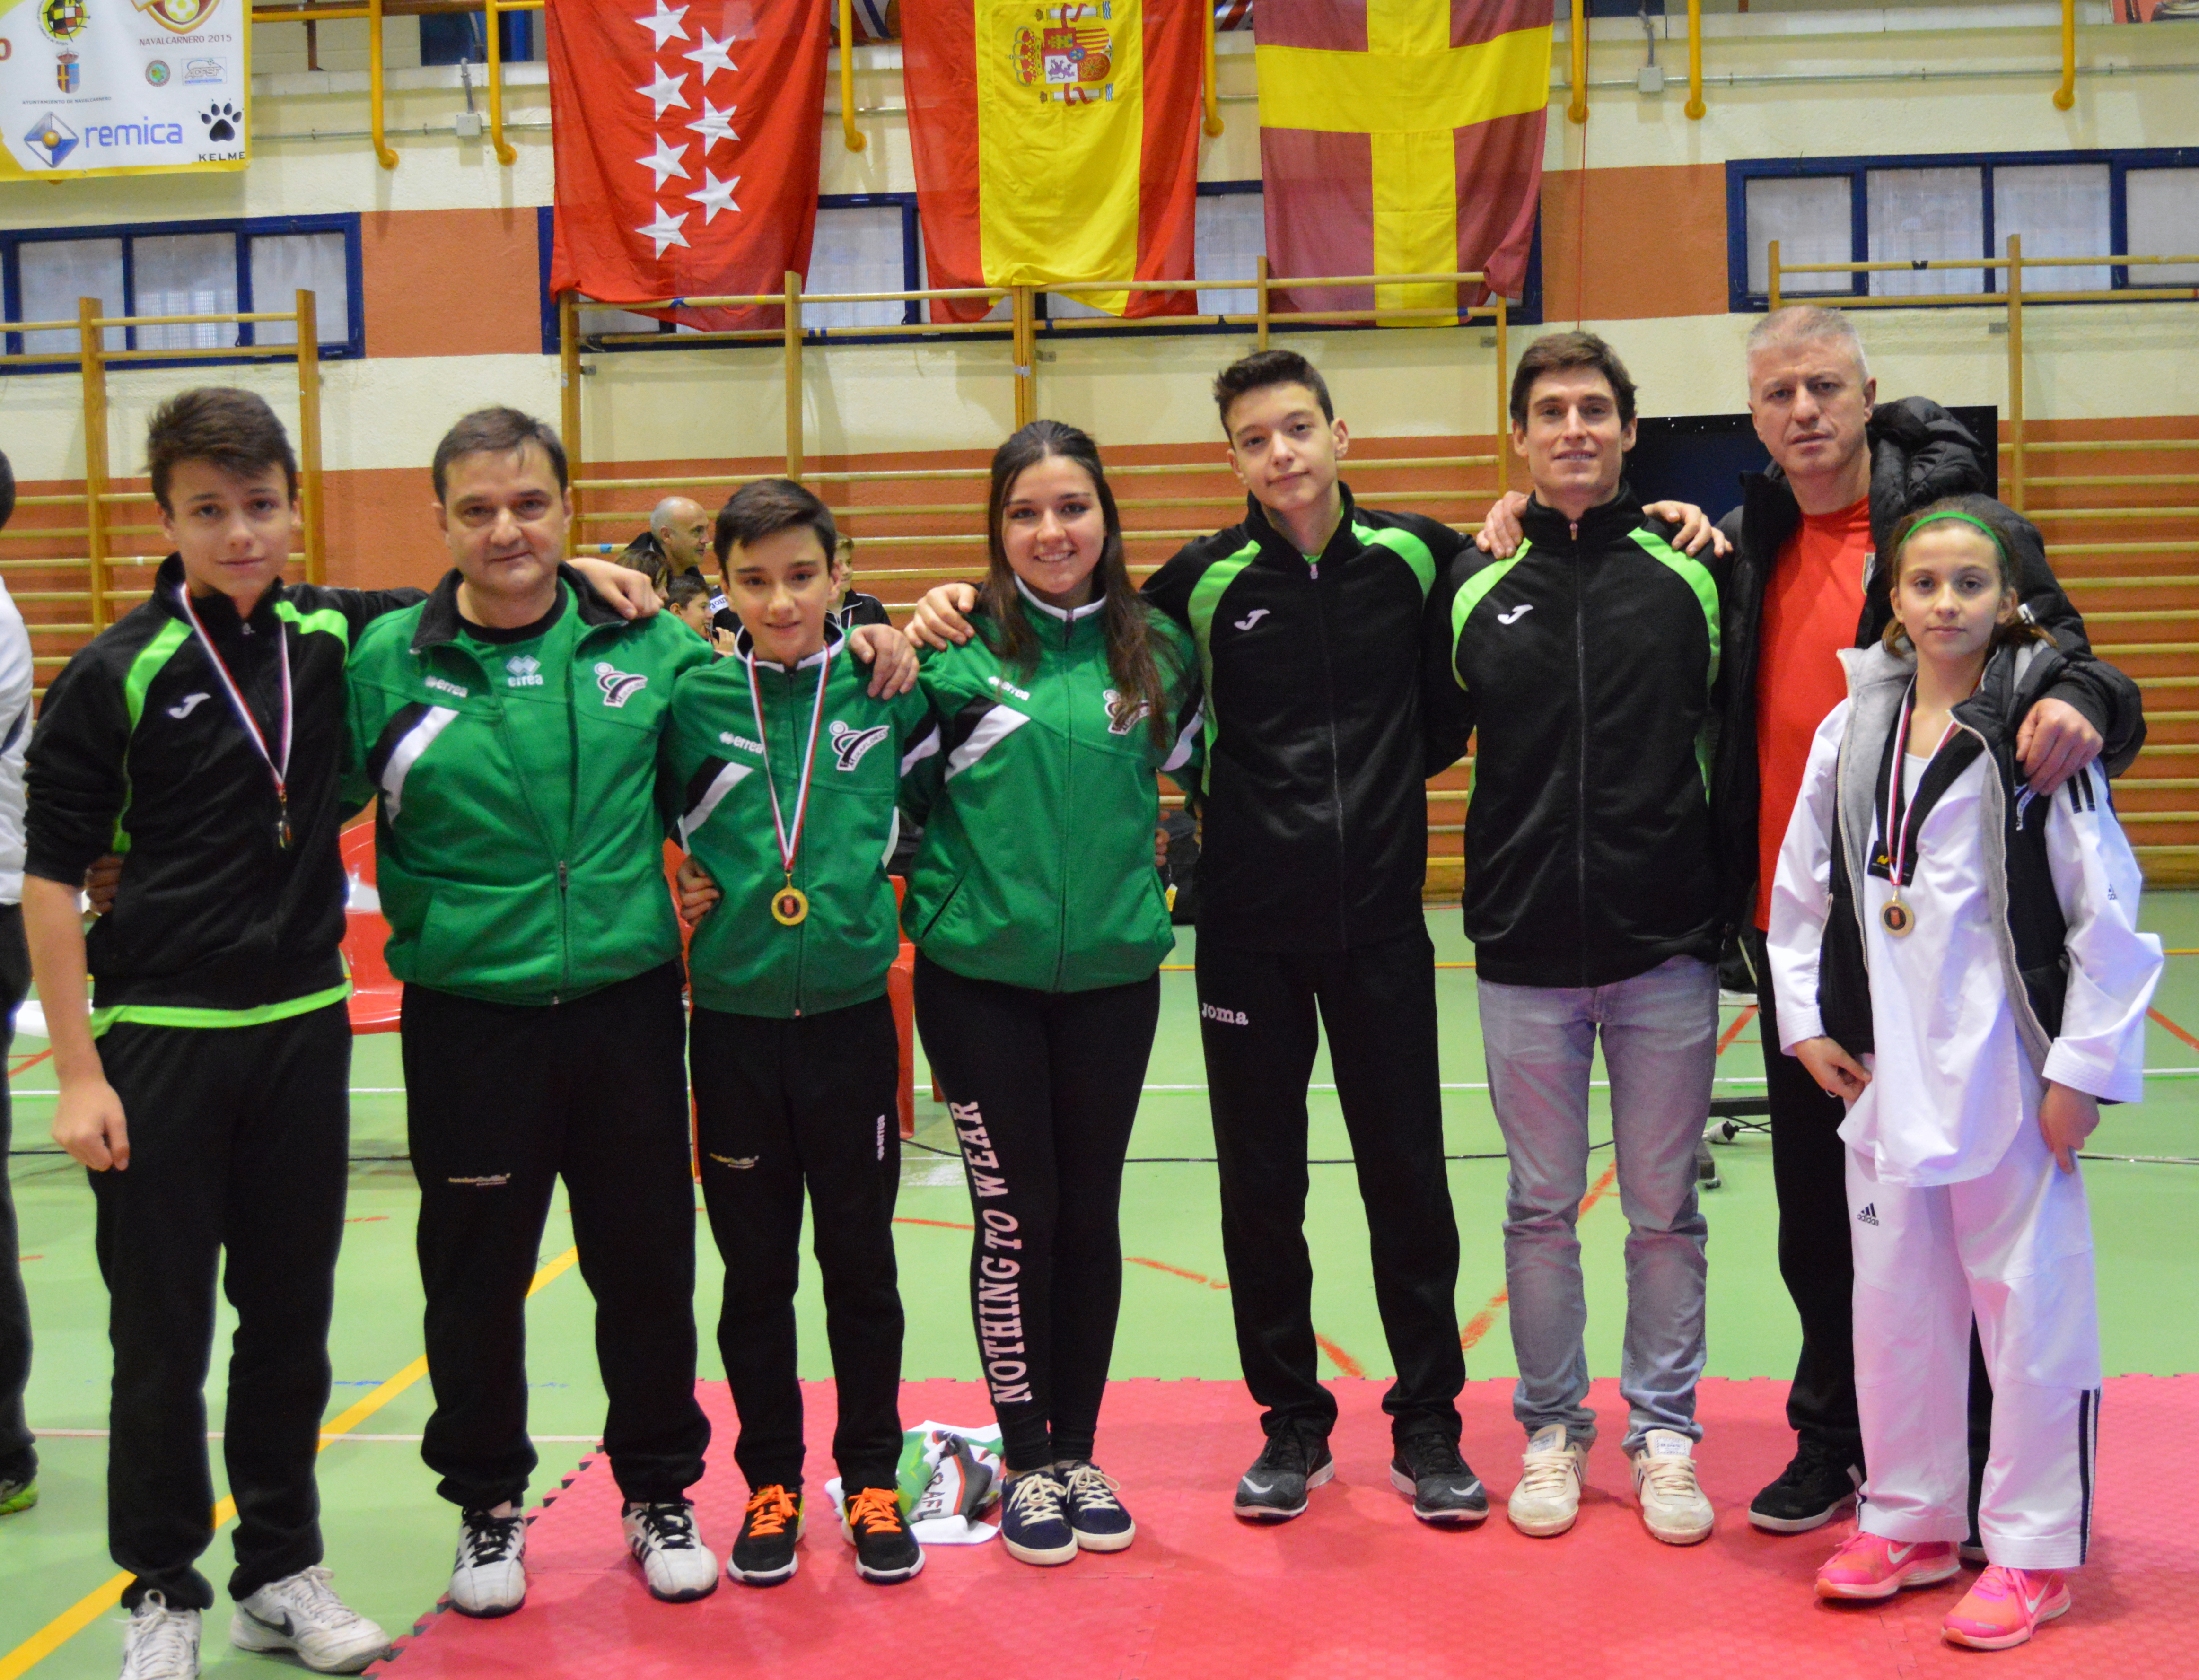 Fin de Semana intenso para el Club Taekwondo Bekdoosan-Miraflores